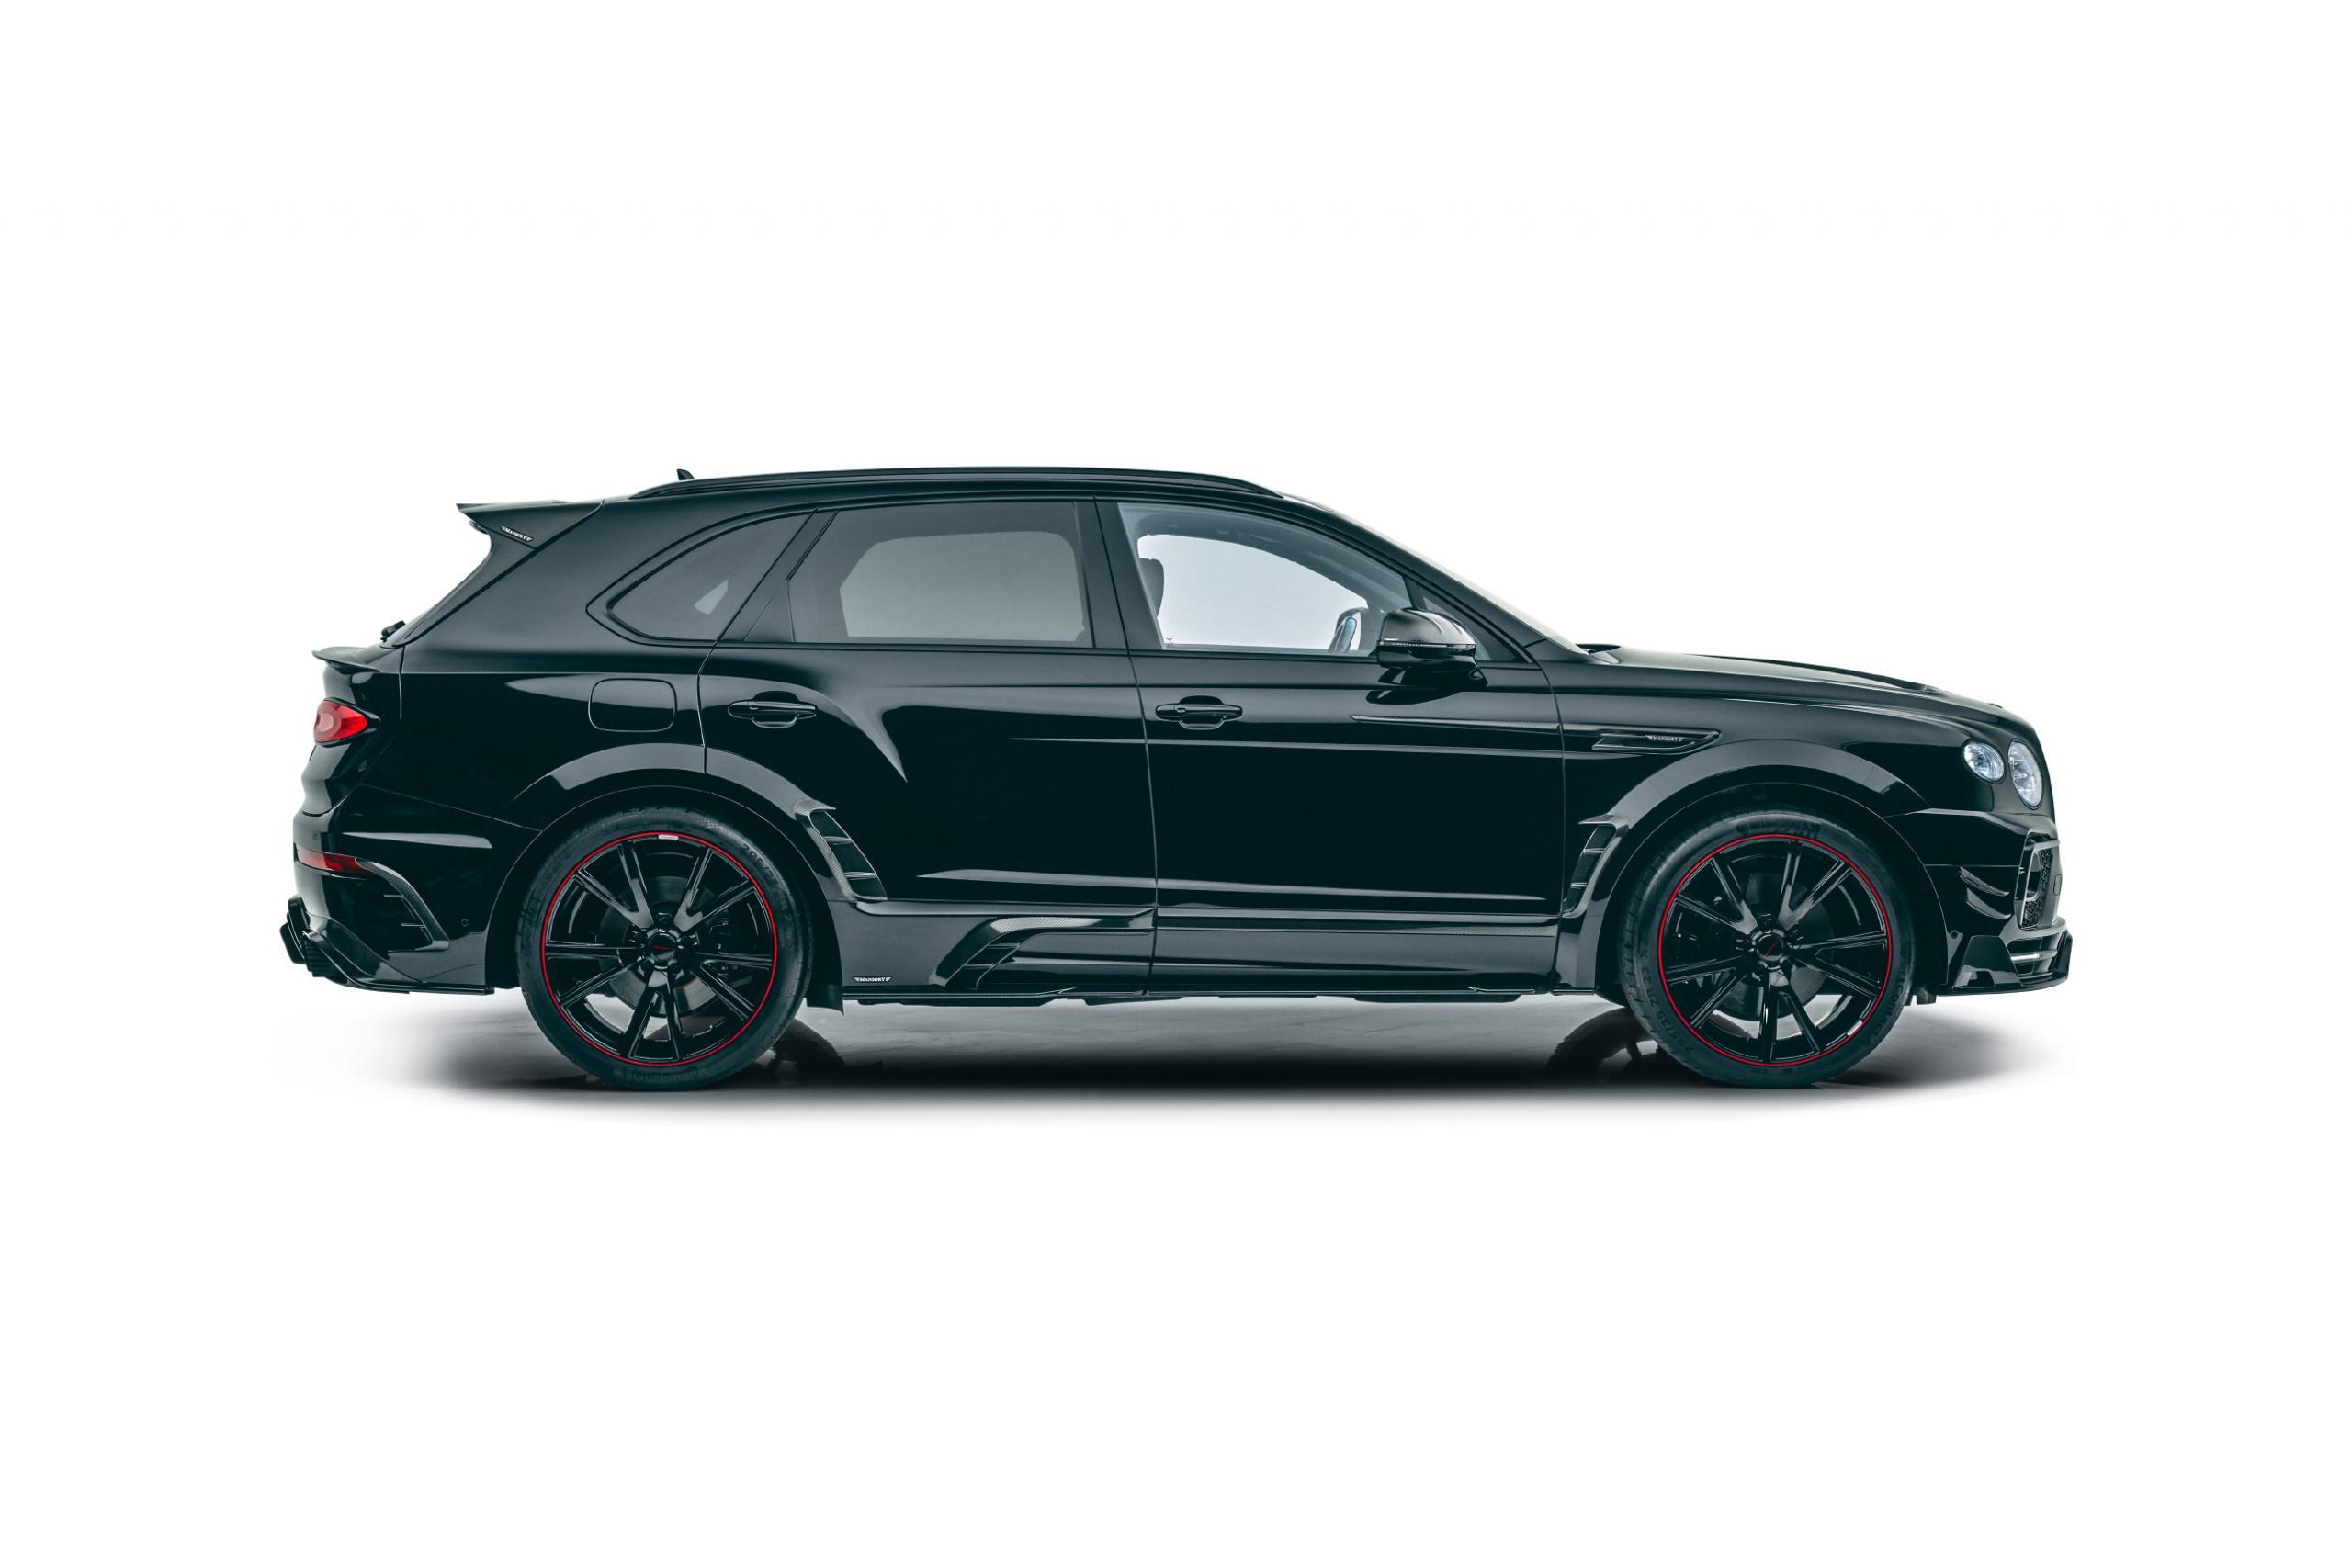 mansory new bentayga wide body kit carbon fiber y.5 23 wheel 2021 side